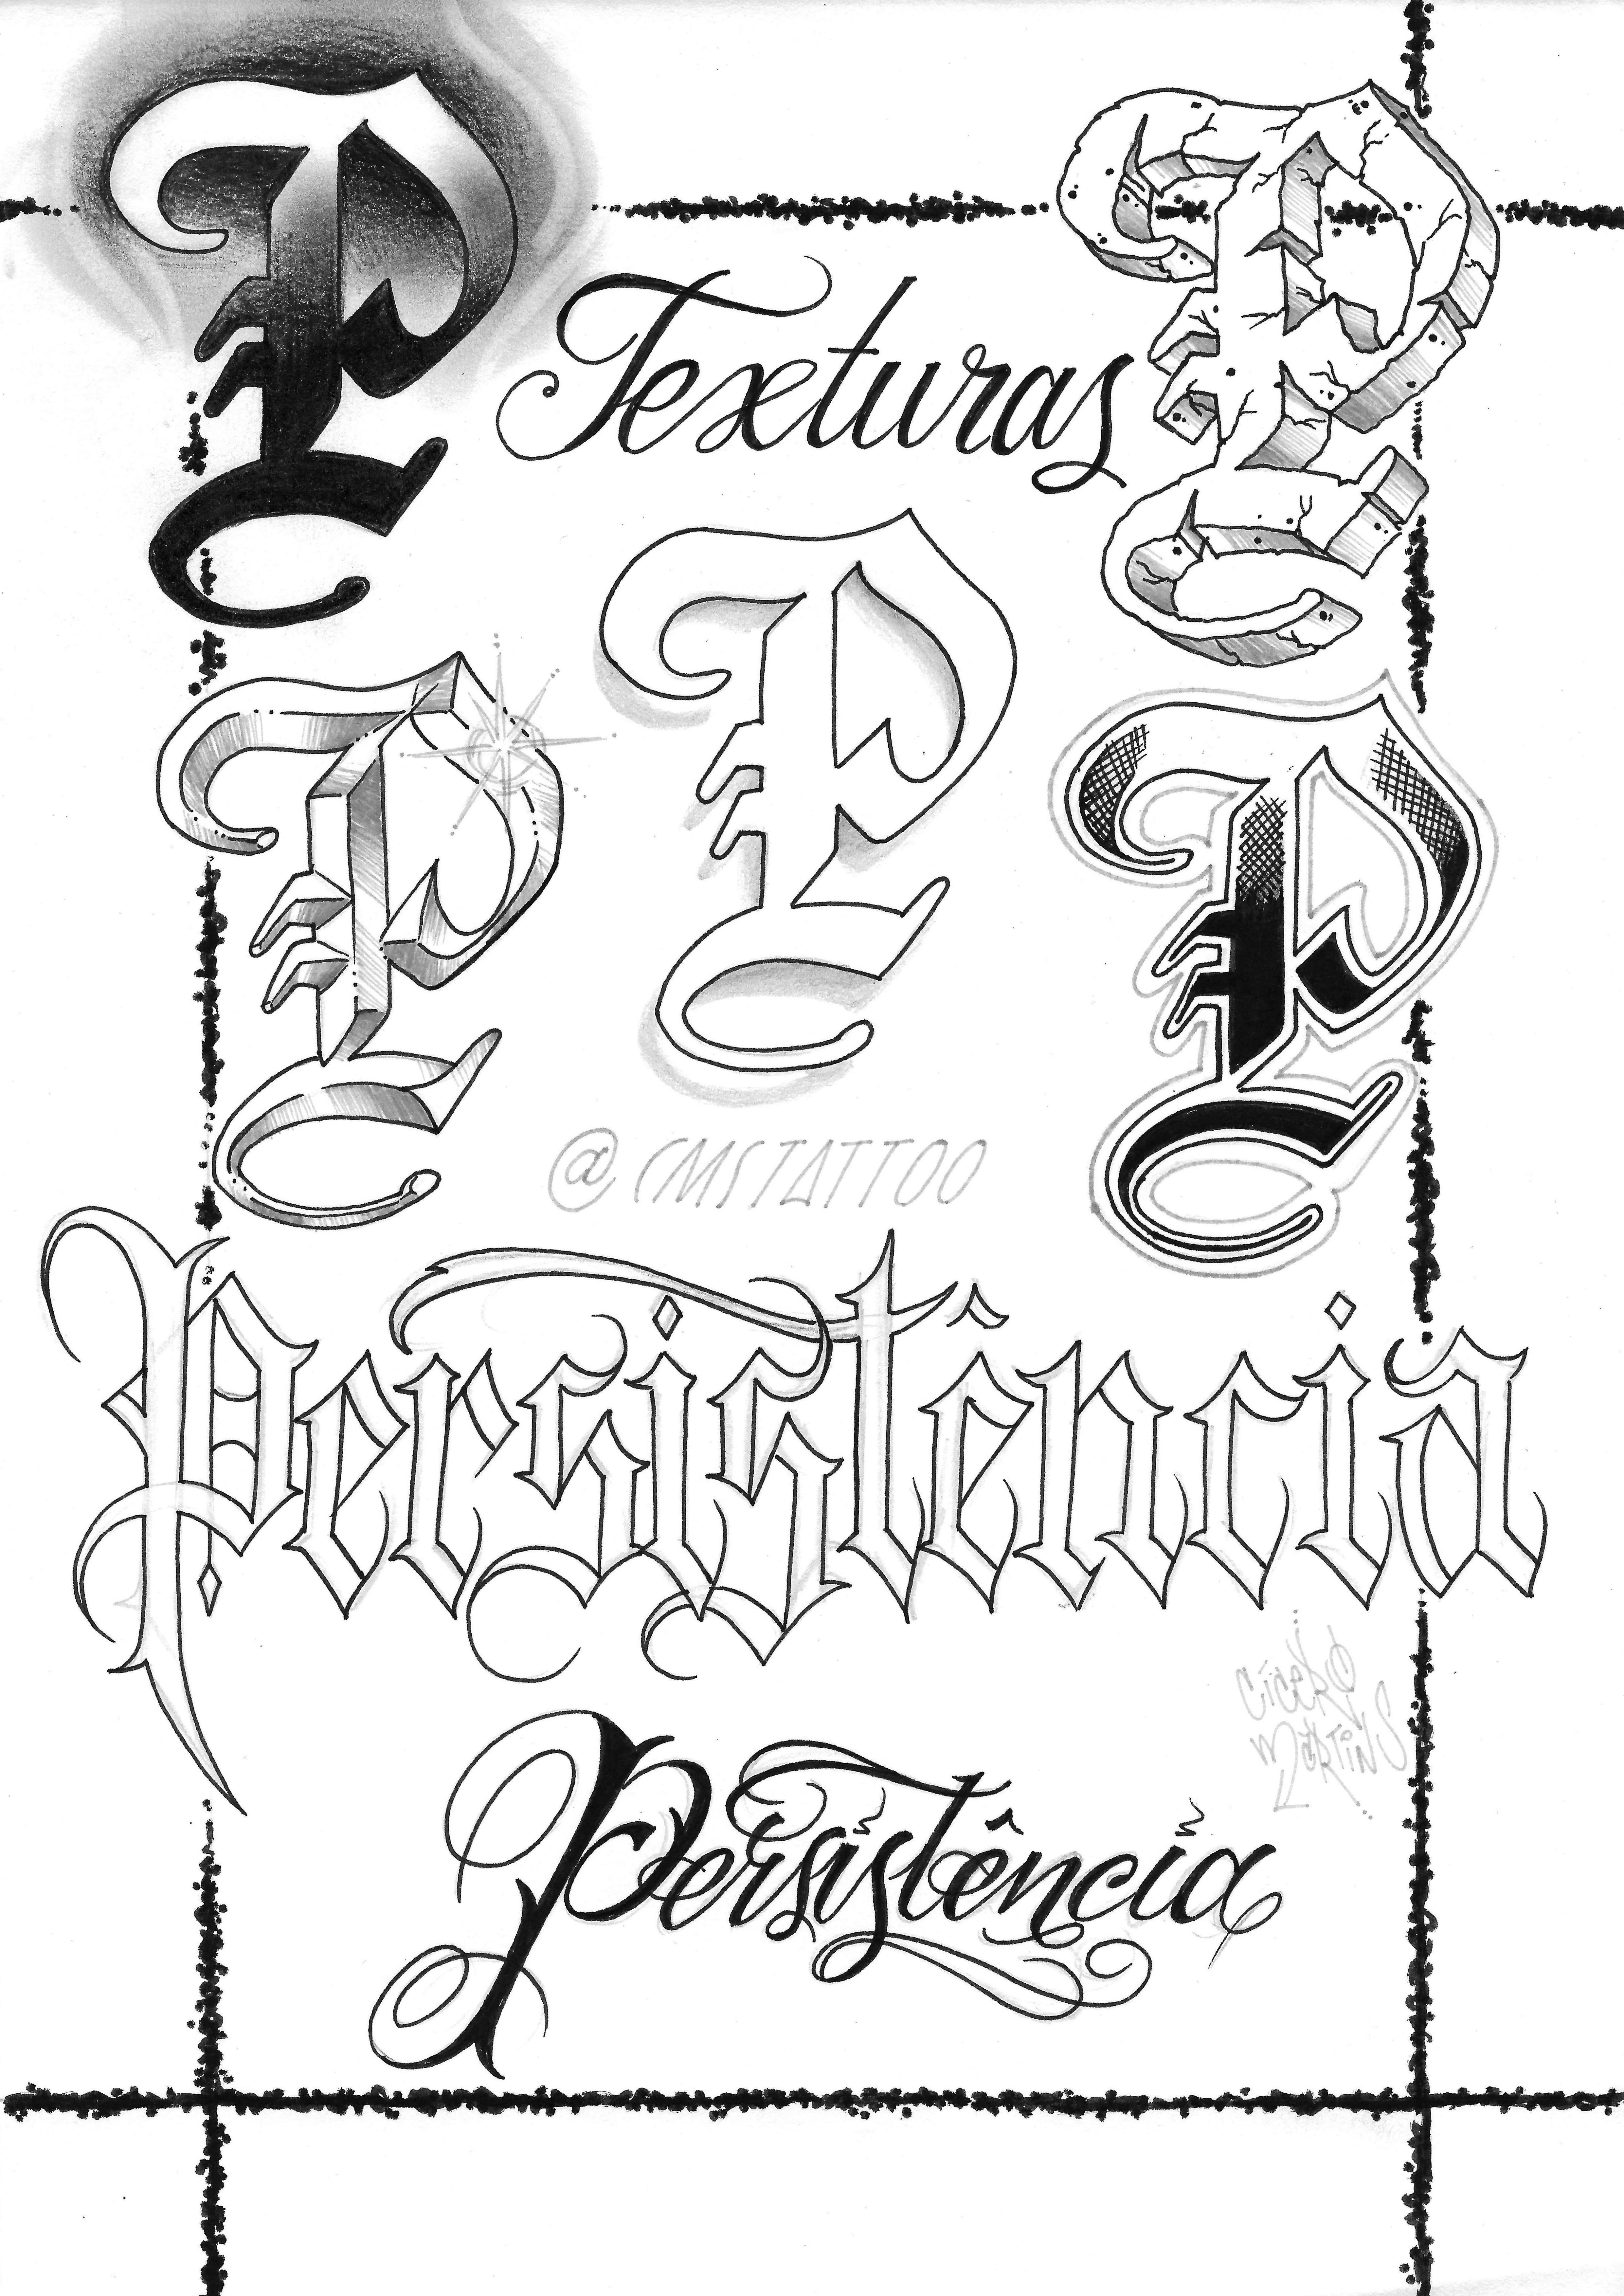 2016 (Serie Sckrita) Letras de grafite, Fontes de